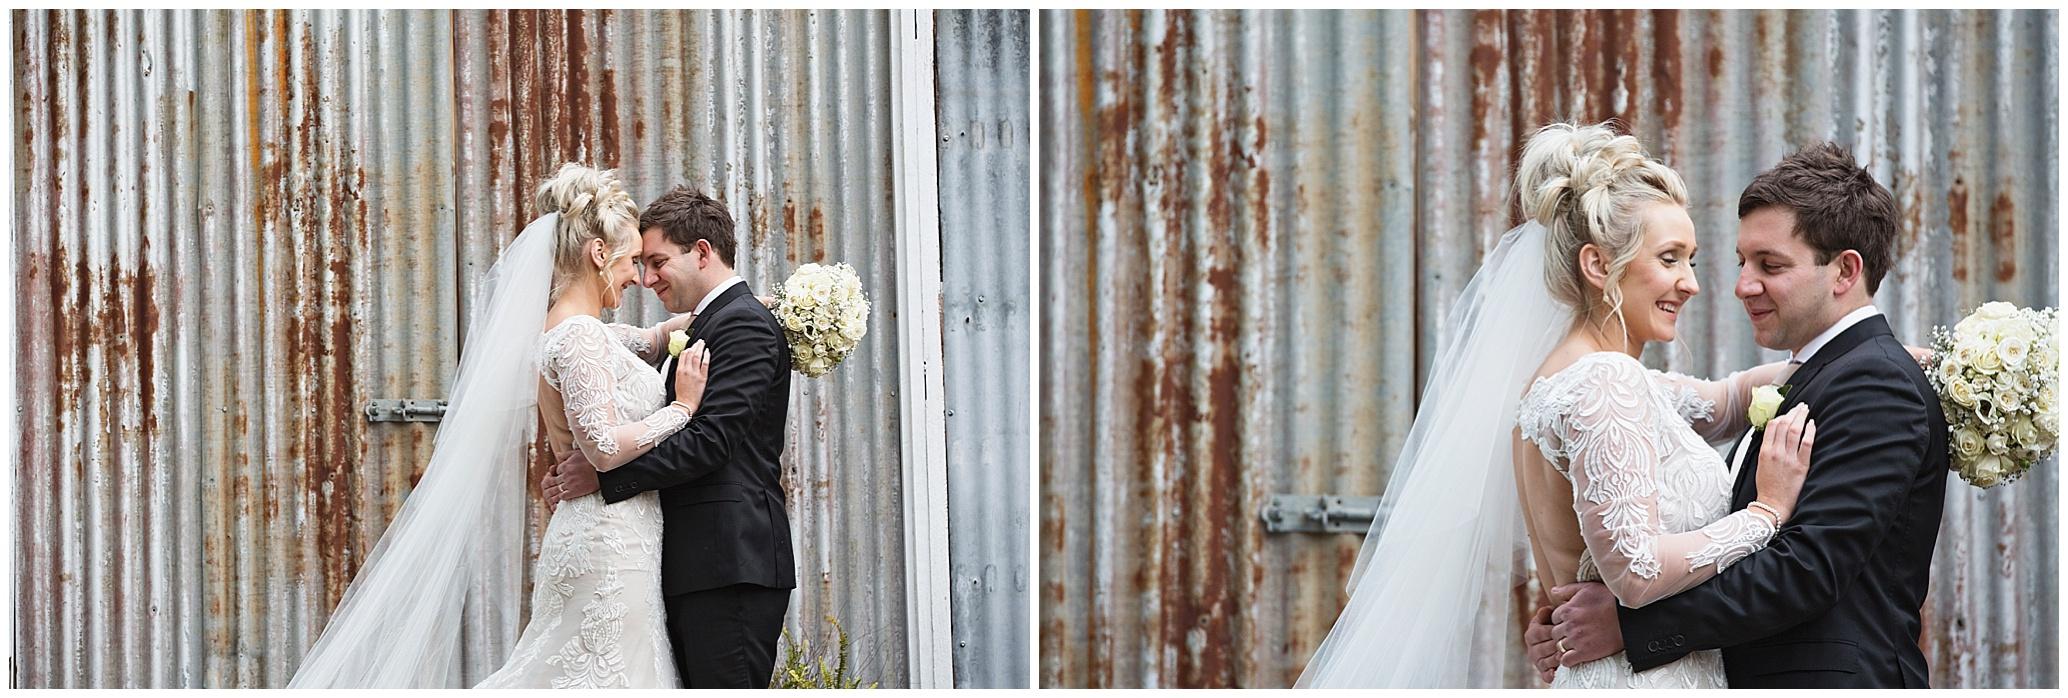 yarrawonga-wedding-photographer_0242.jpg